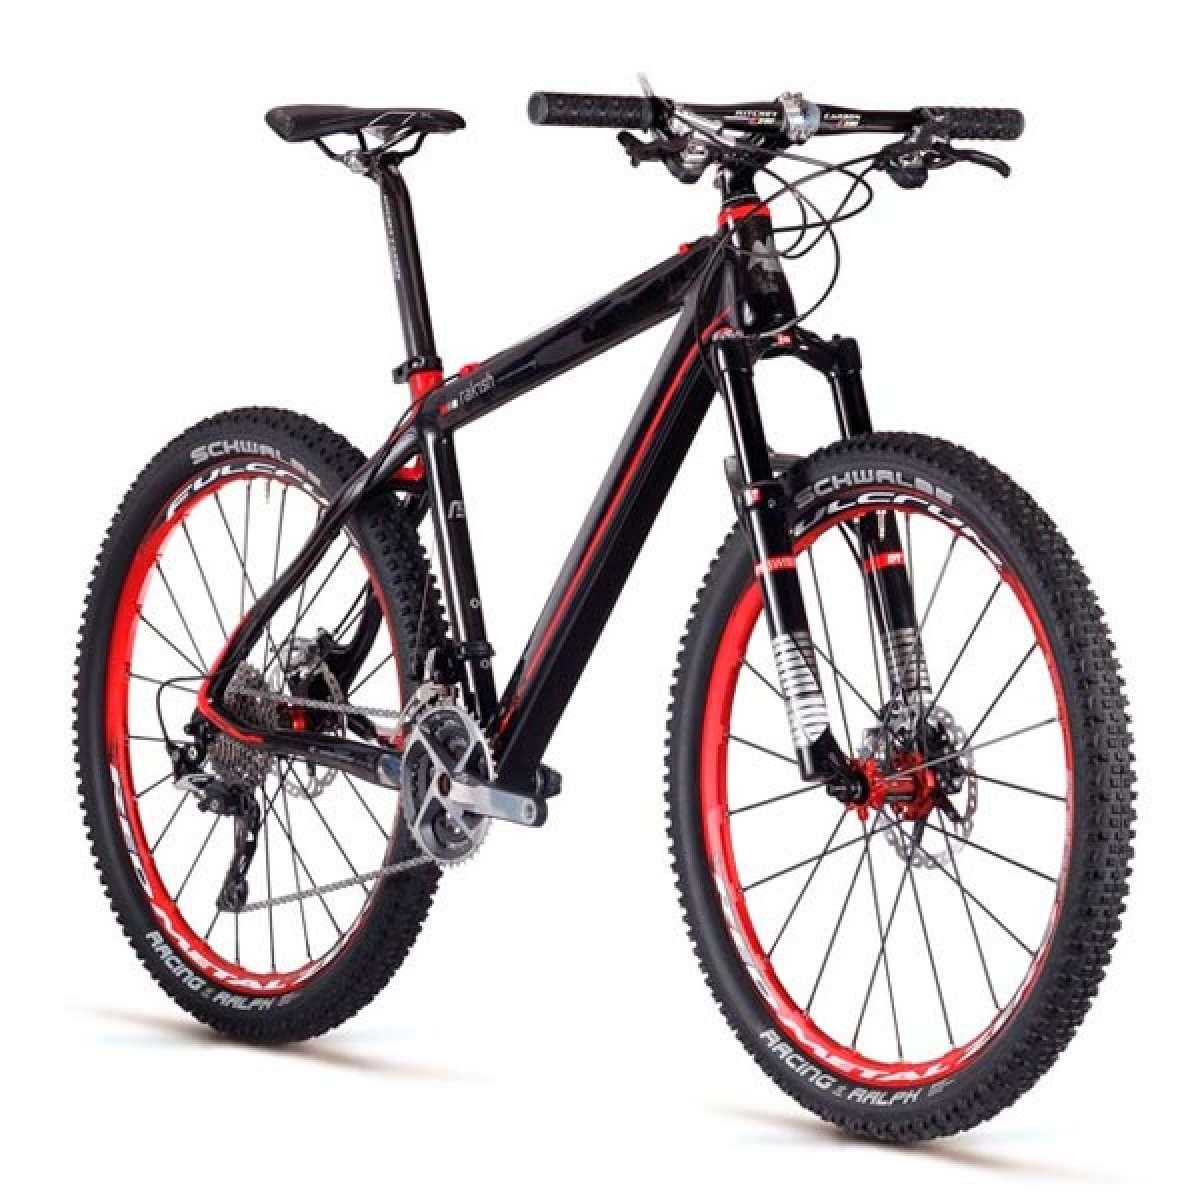 MMR Rakish 2012. La bestia negra de la gama de bicicletas rígidas de MMR